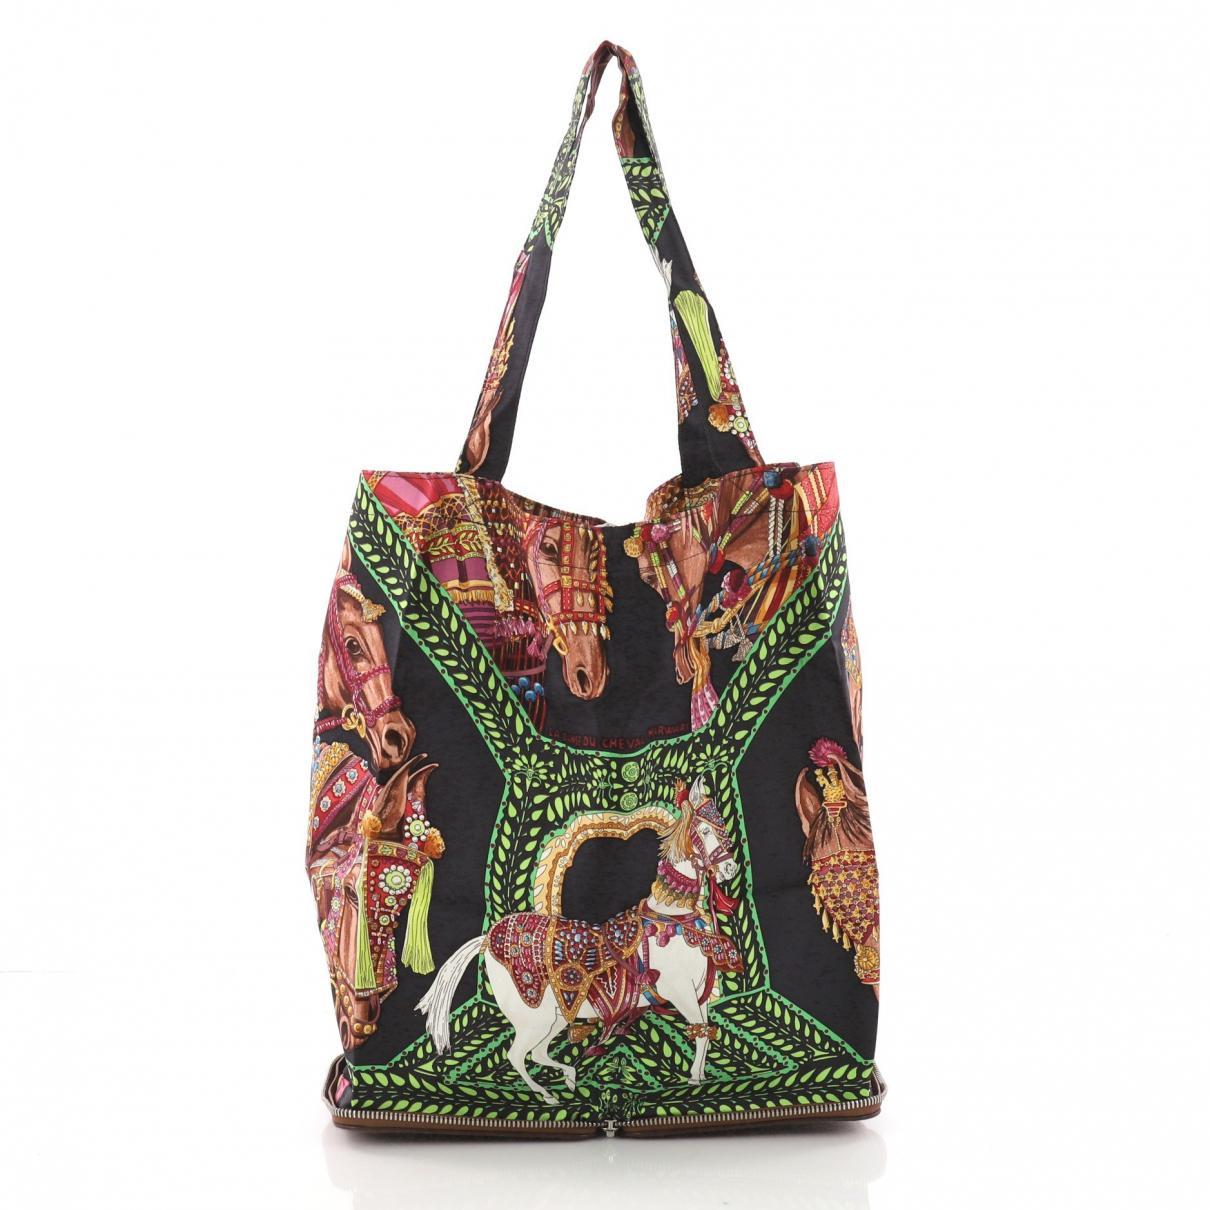 e52d30c82381 Hermès. Women s Pre-owned Silky Pop Tote